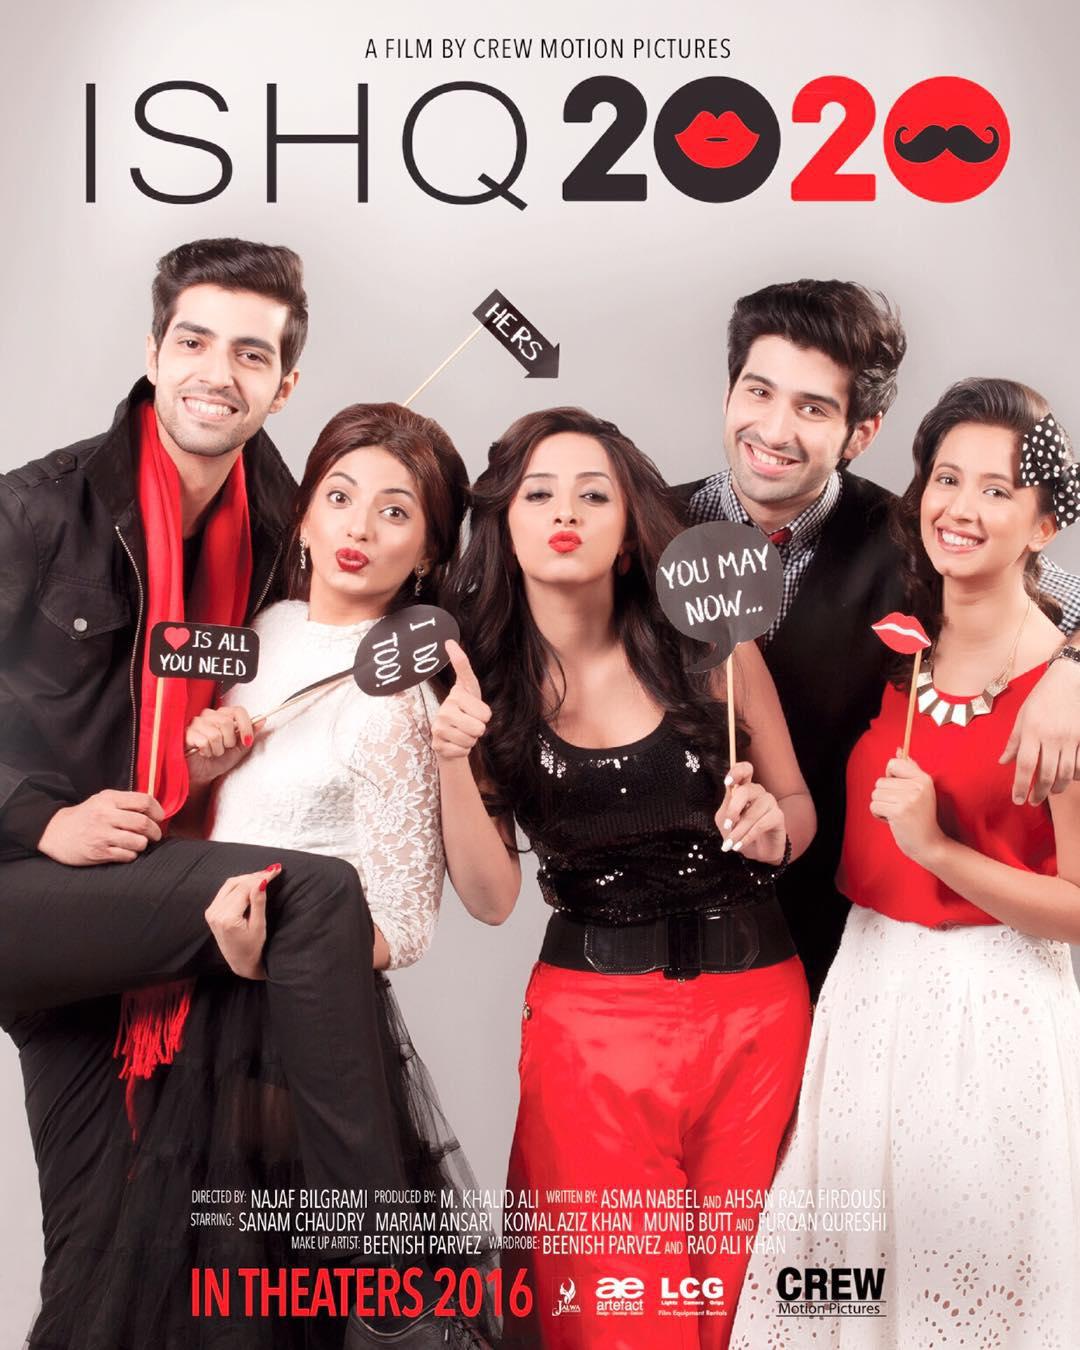 ishq 2020 movie poster